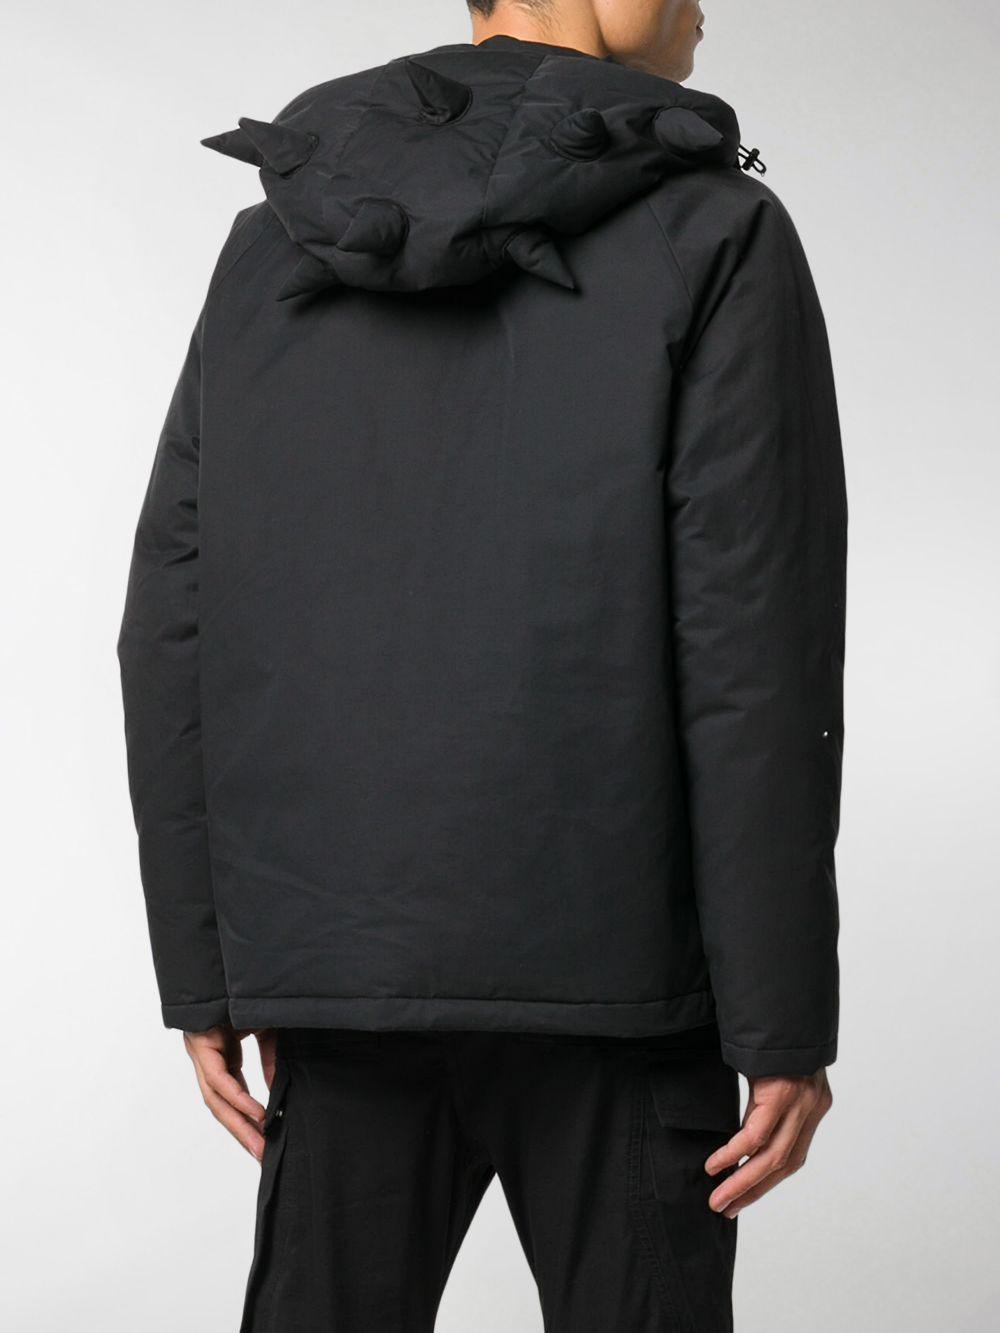 Moncler Genius x Jw Anderson black cotton and polyamine down jacket  MONCLER GENIUS      HIGHCLERE 1B504-40-V0135999